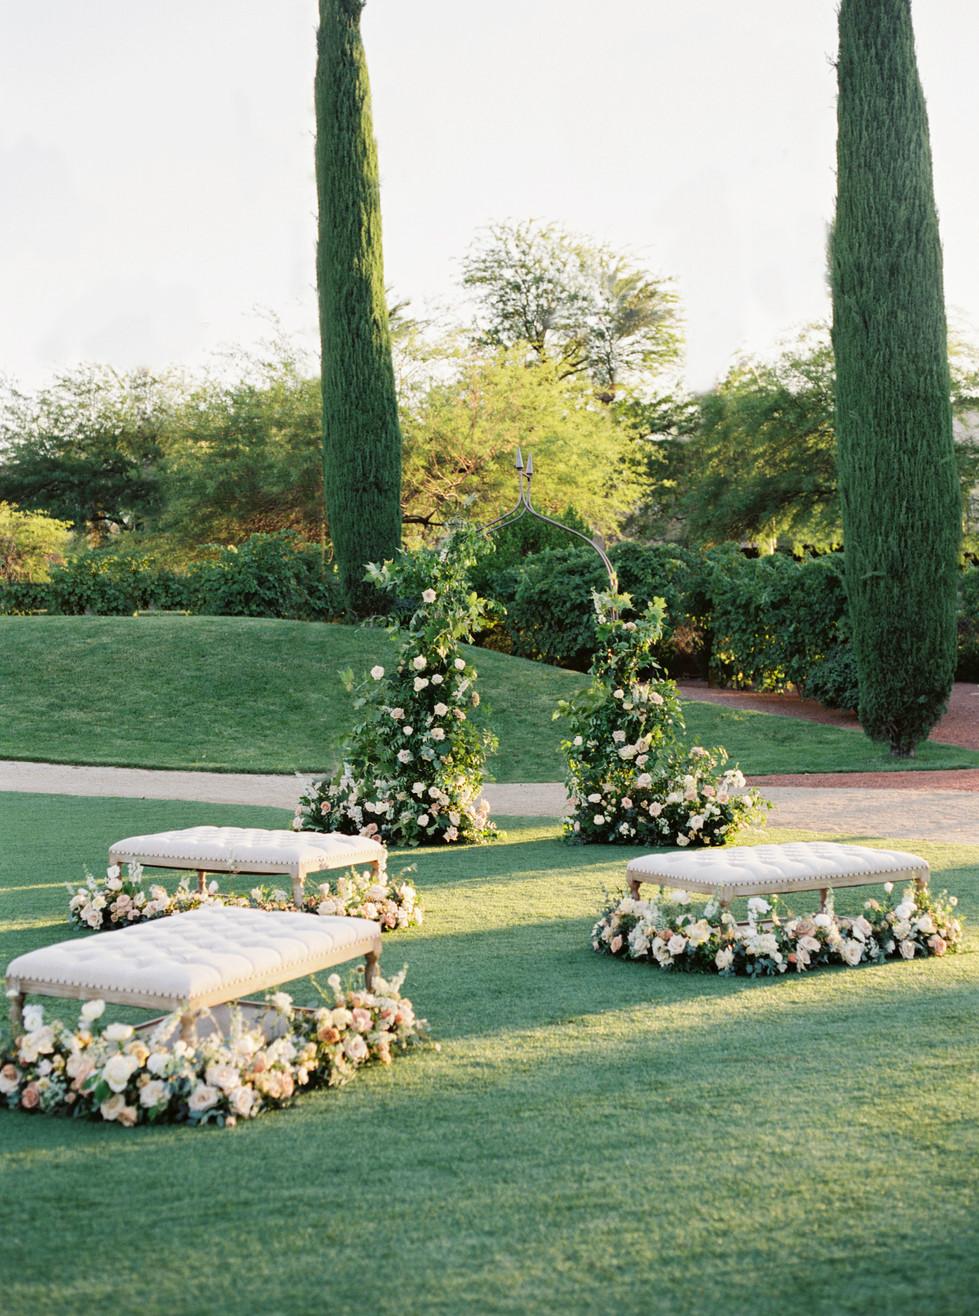 Micro wedding at Green Valley Ranch Resort. Photo: Lianna Marie